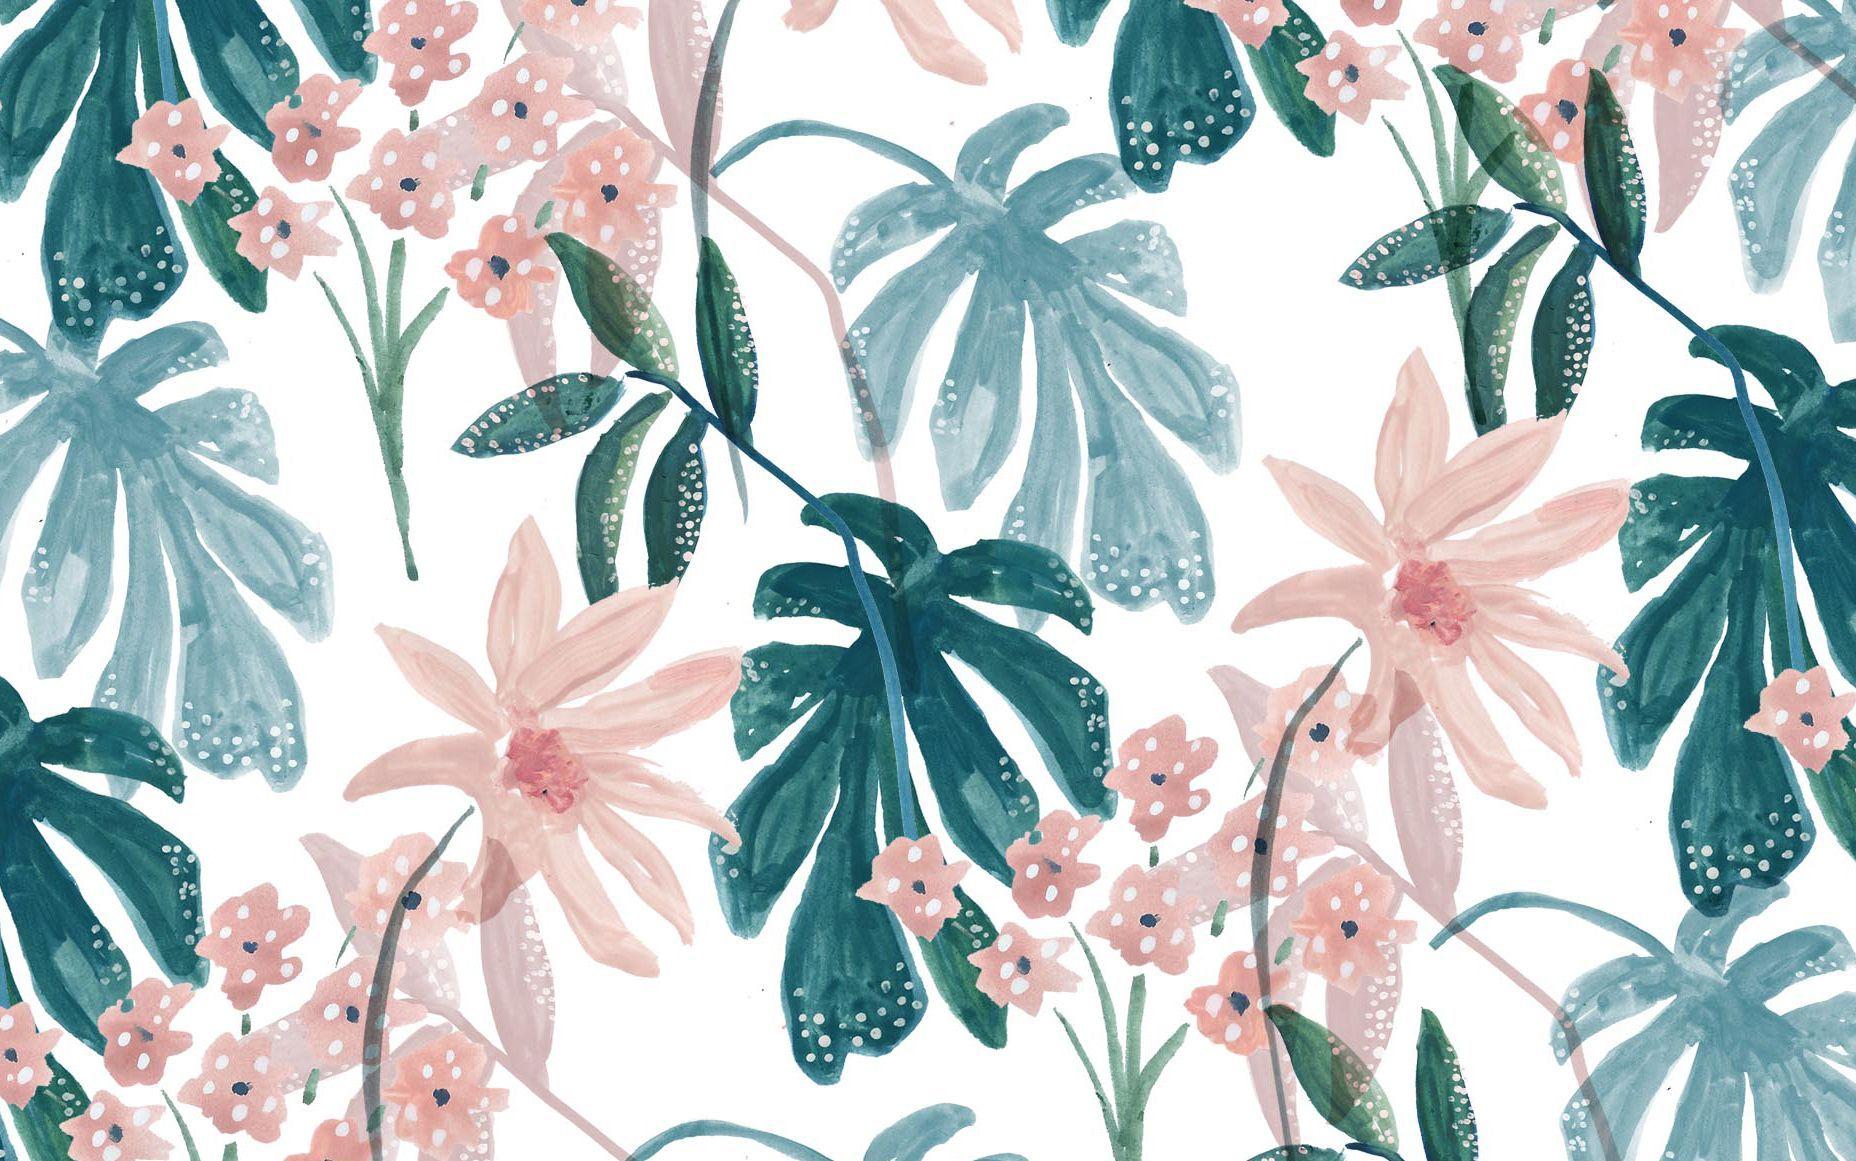 Design Love Fest Wallpaper Fall Fondos Para Pc Wallpaper En 2019 Fondo De Pantalla